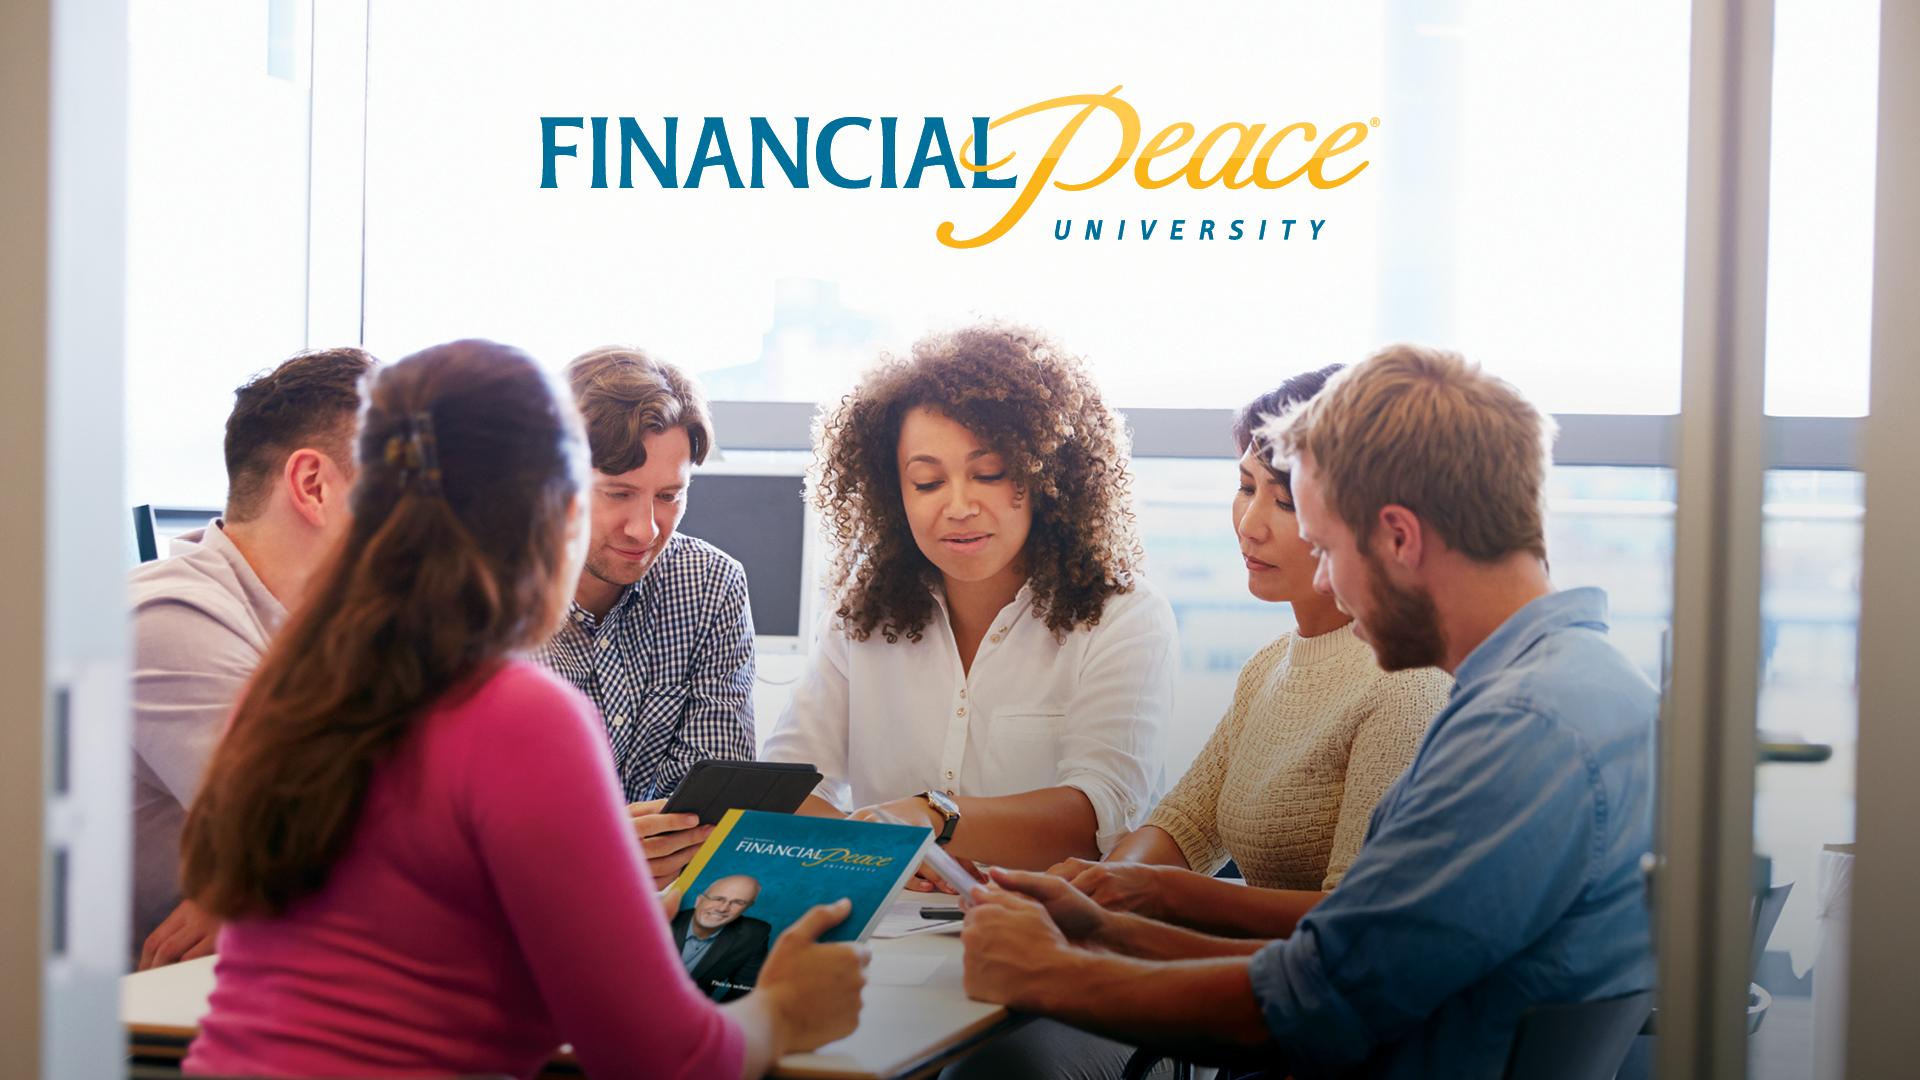 financial-peace-slide-classroom.jpg